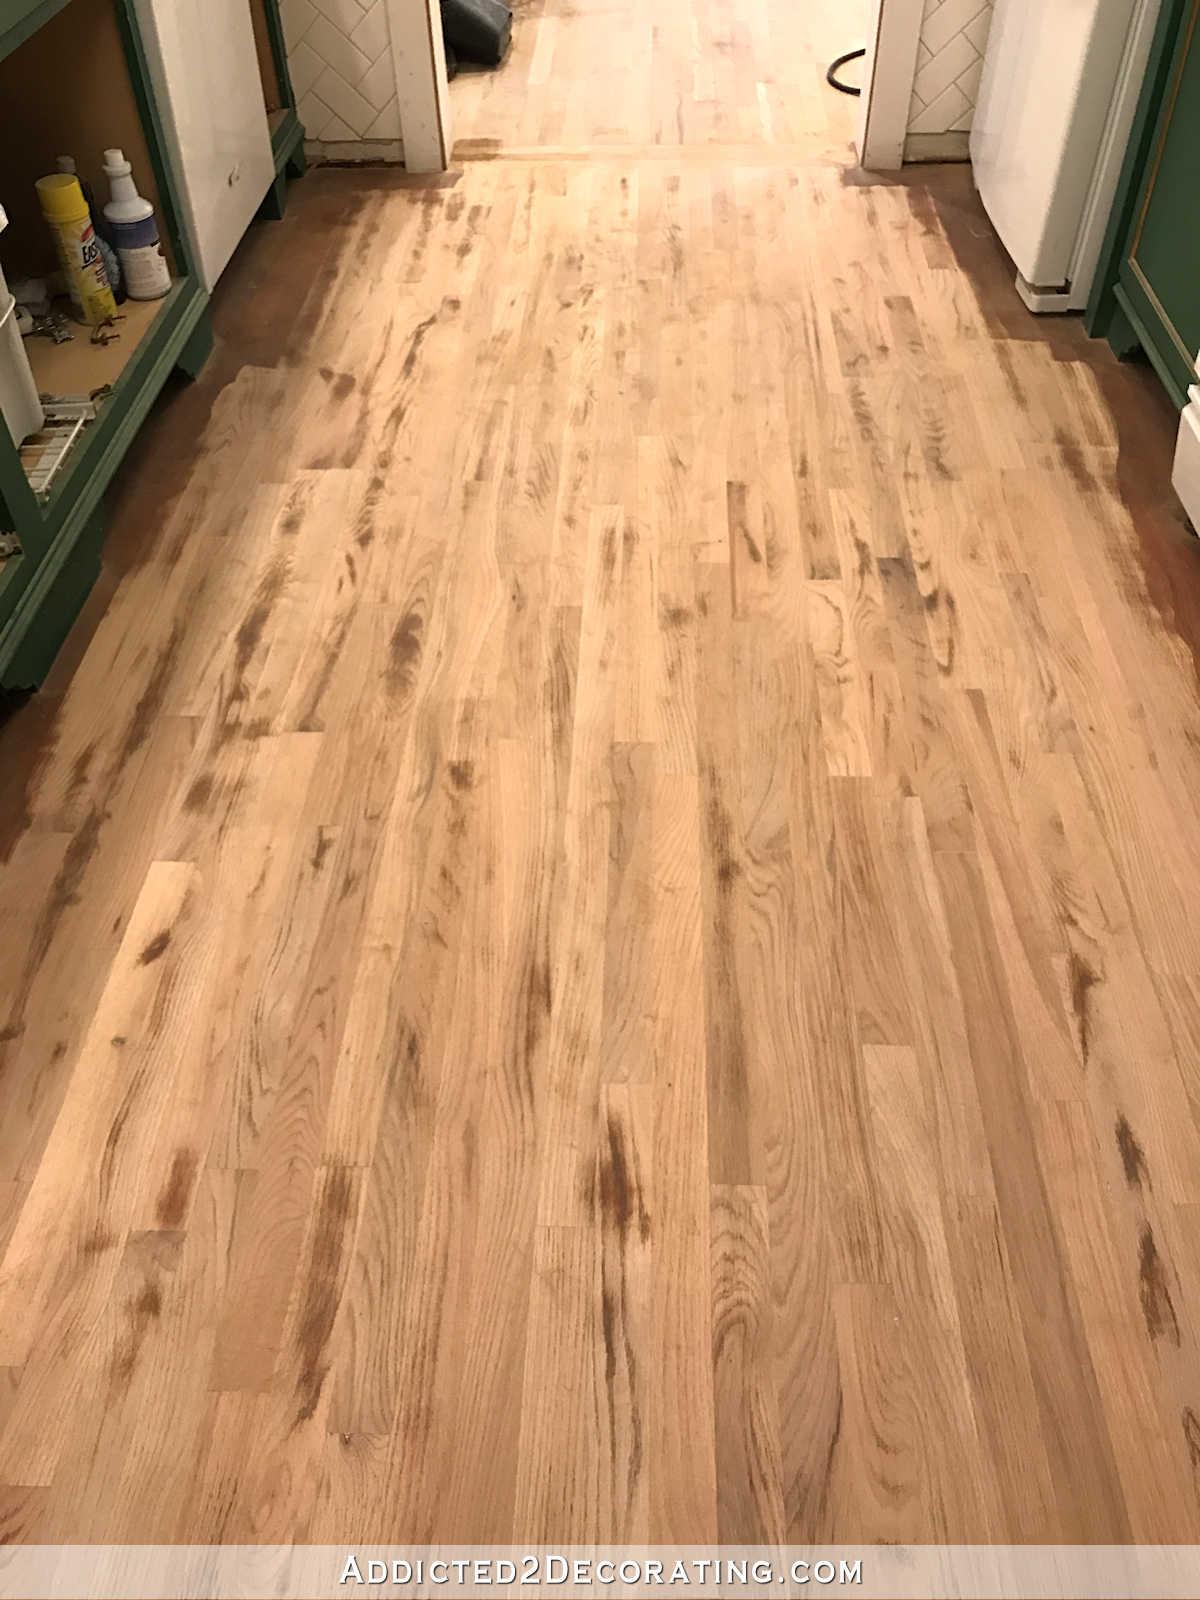 Refinishing My Hardwood Floors  Sanding Progress